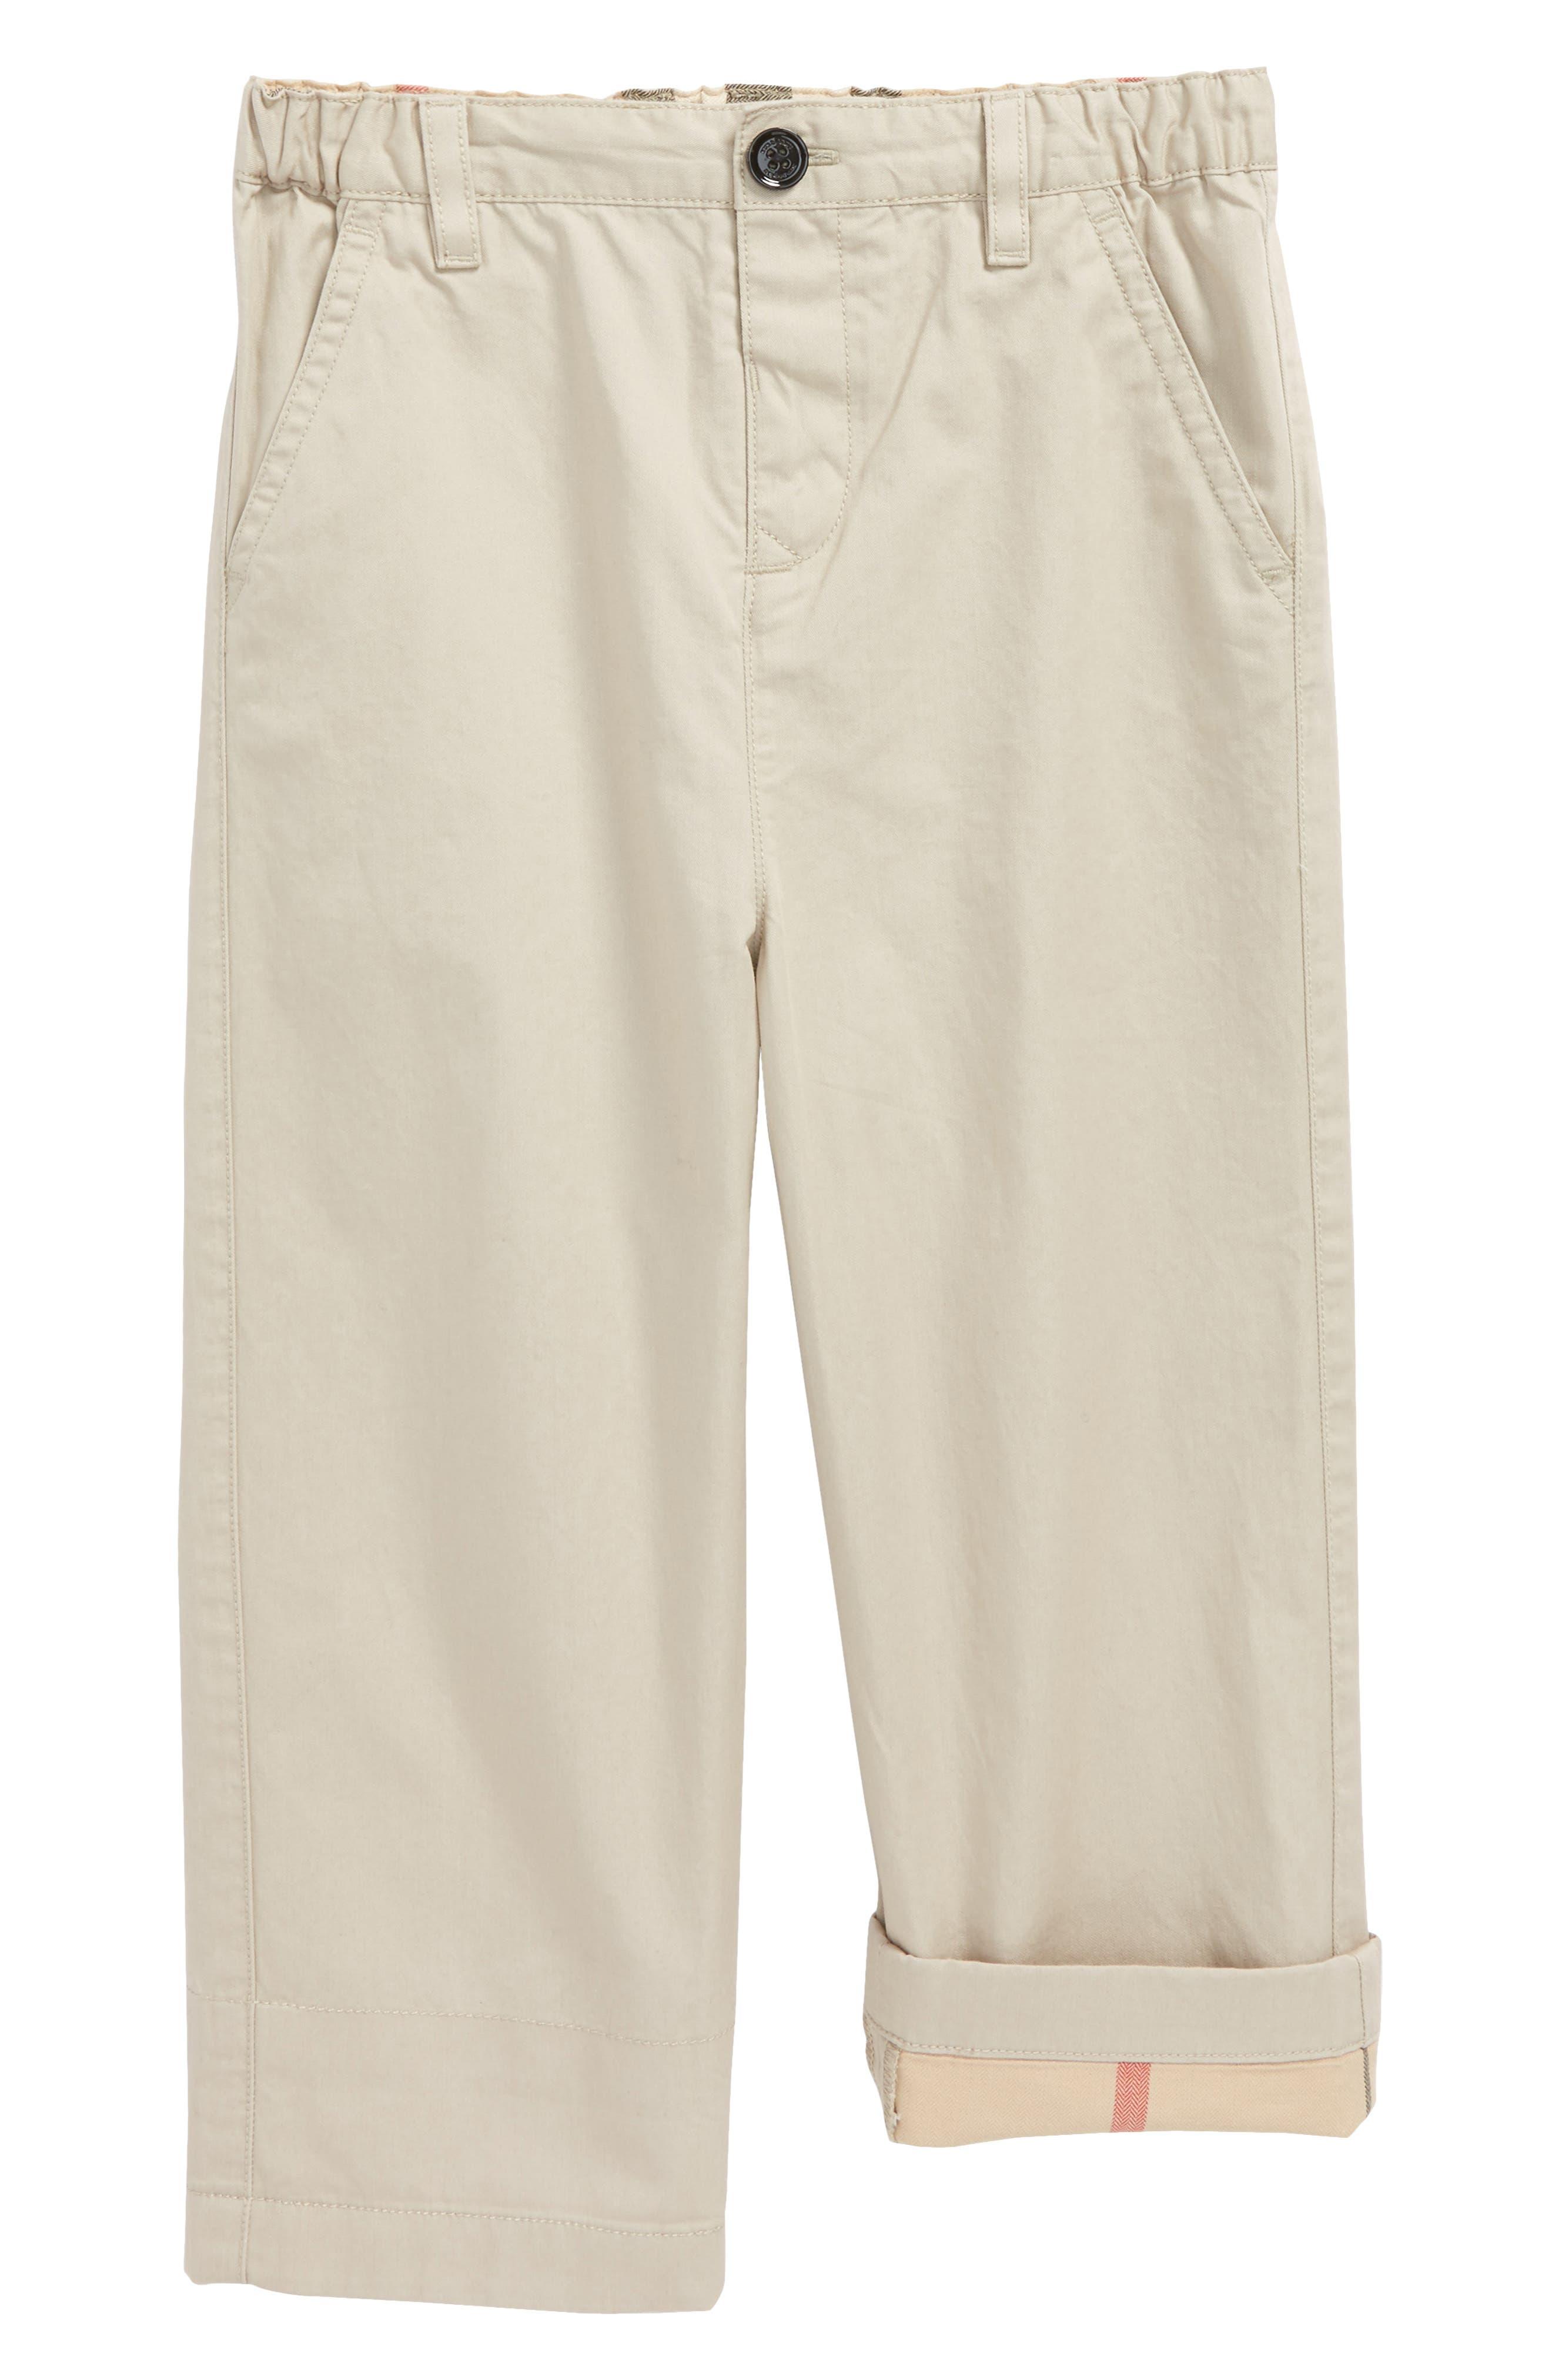 Burberry Ricky Check Lined Pants (Baby Boys \u0026 Toddler Boys)